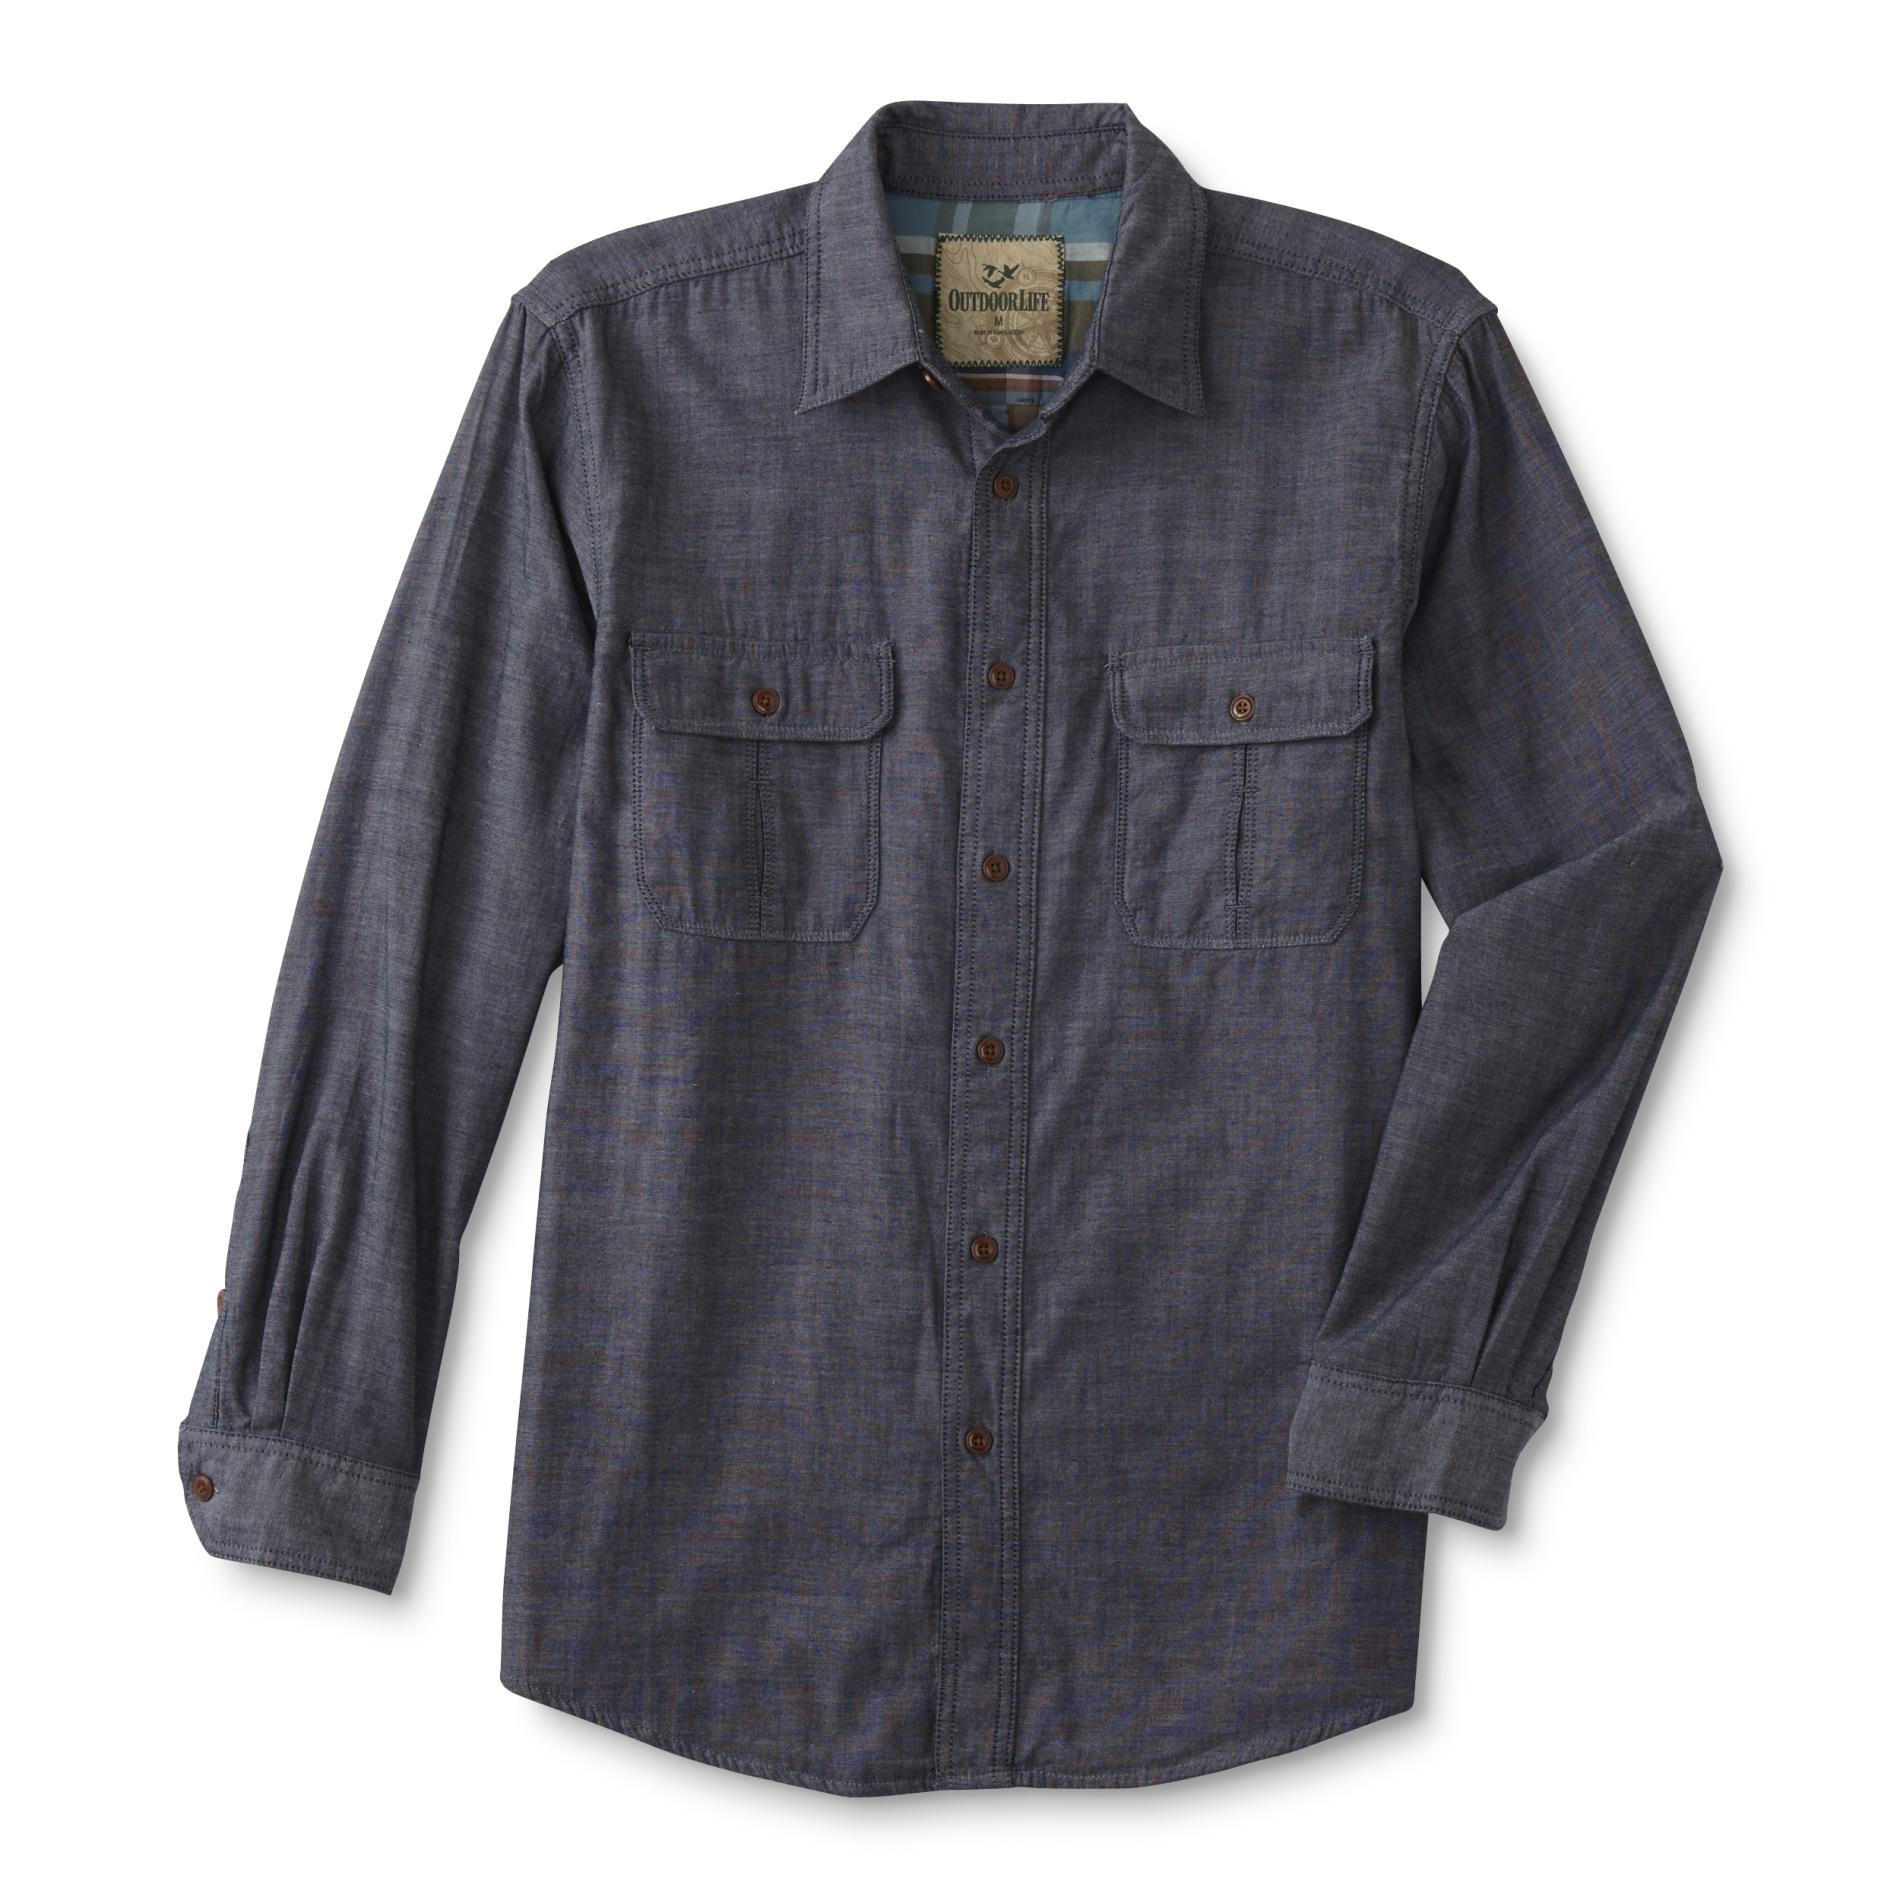 Outdoor life men 39 s long sleeve shirt chambray sears for Mens outdoor long sleeve shirts